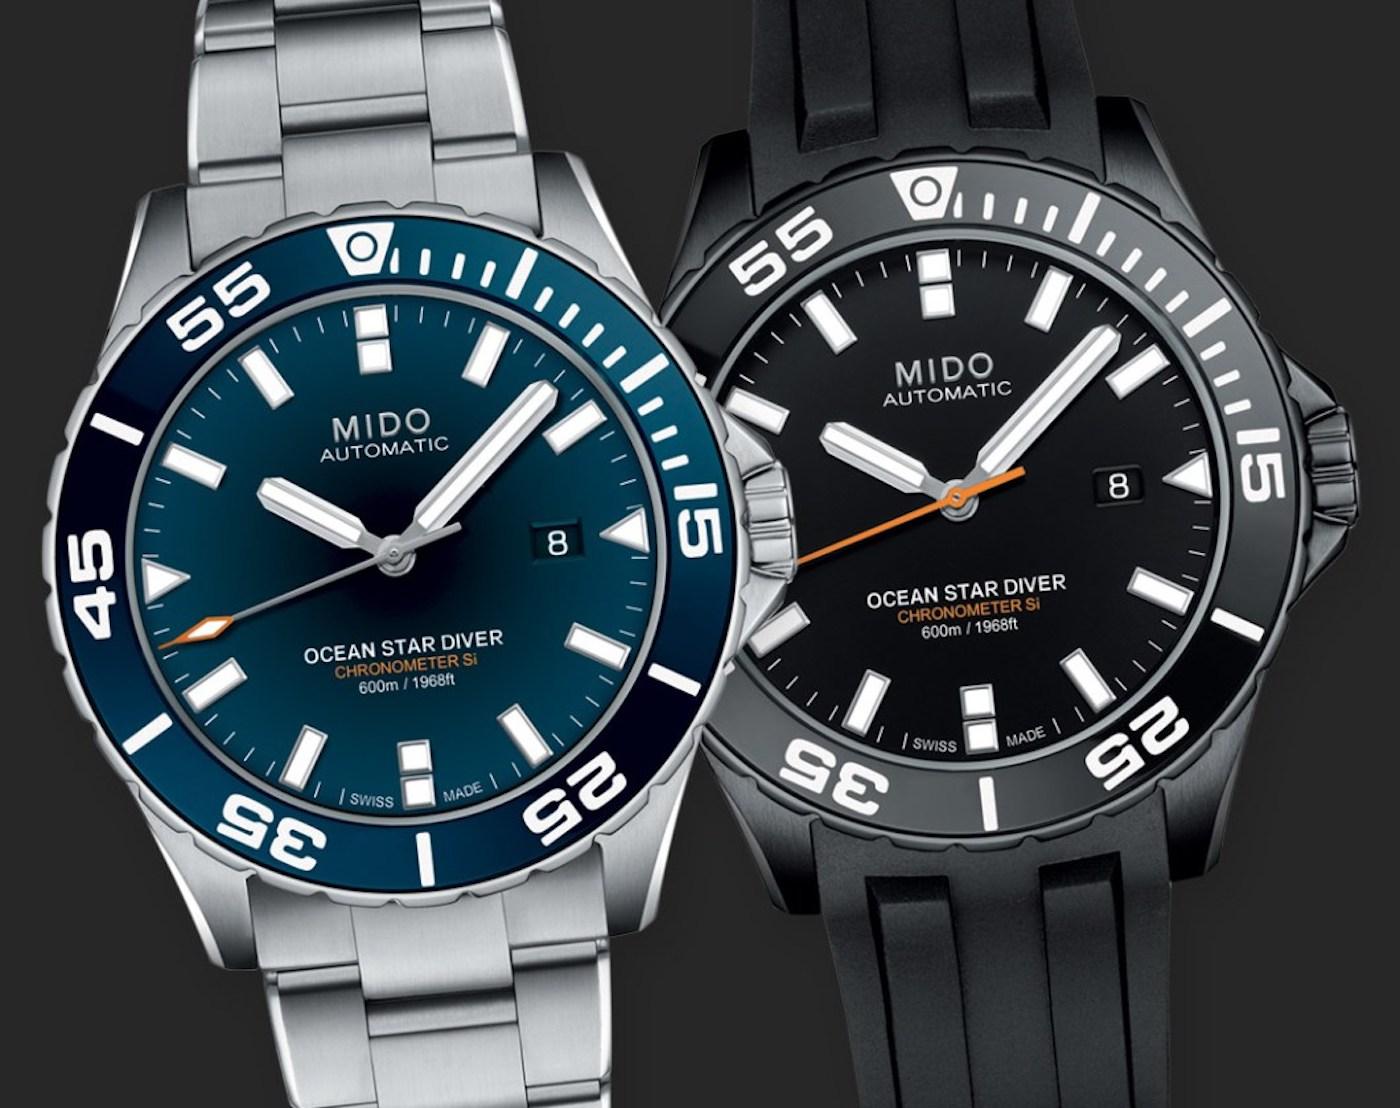 mido-ocean-star-diver-600-2.jpg